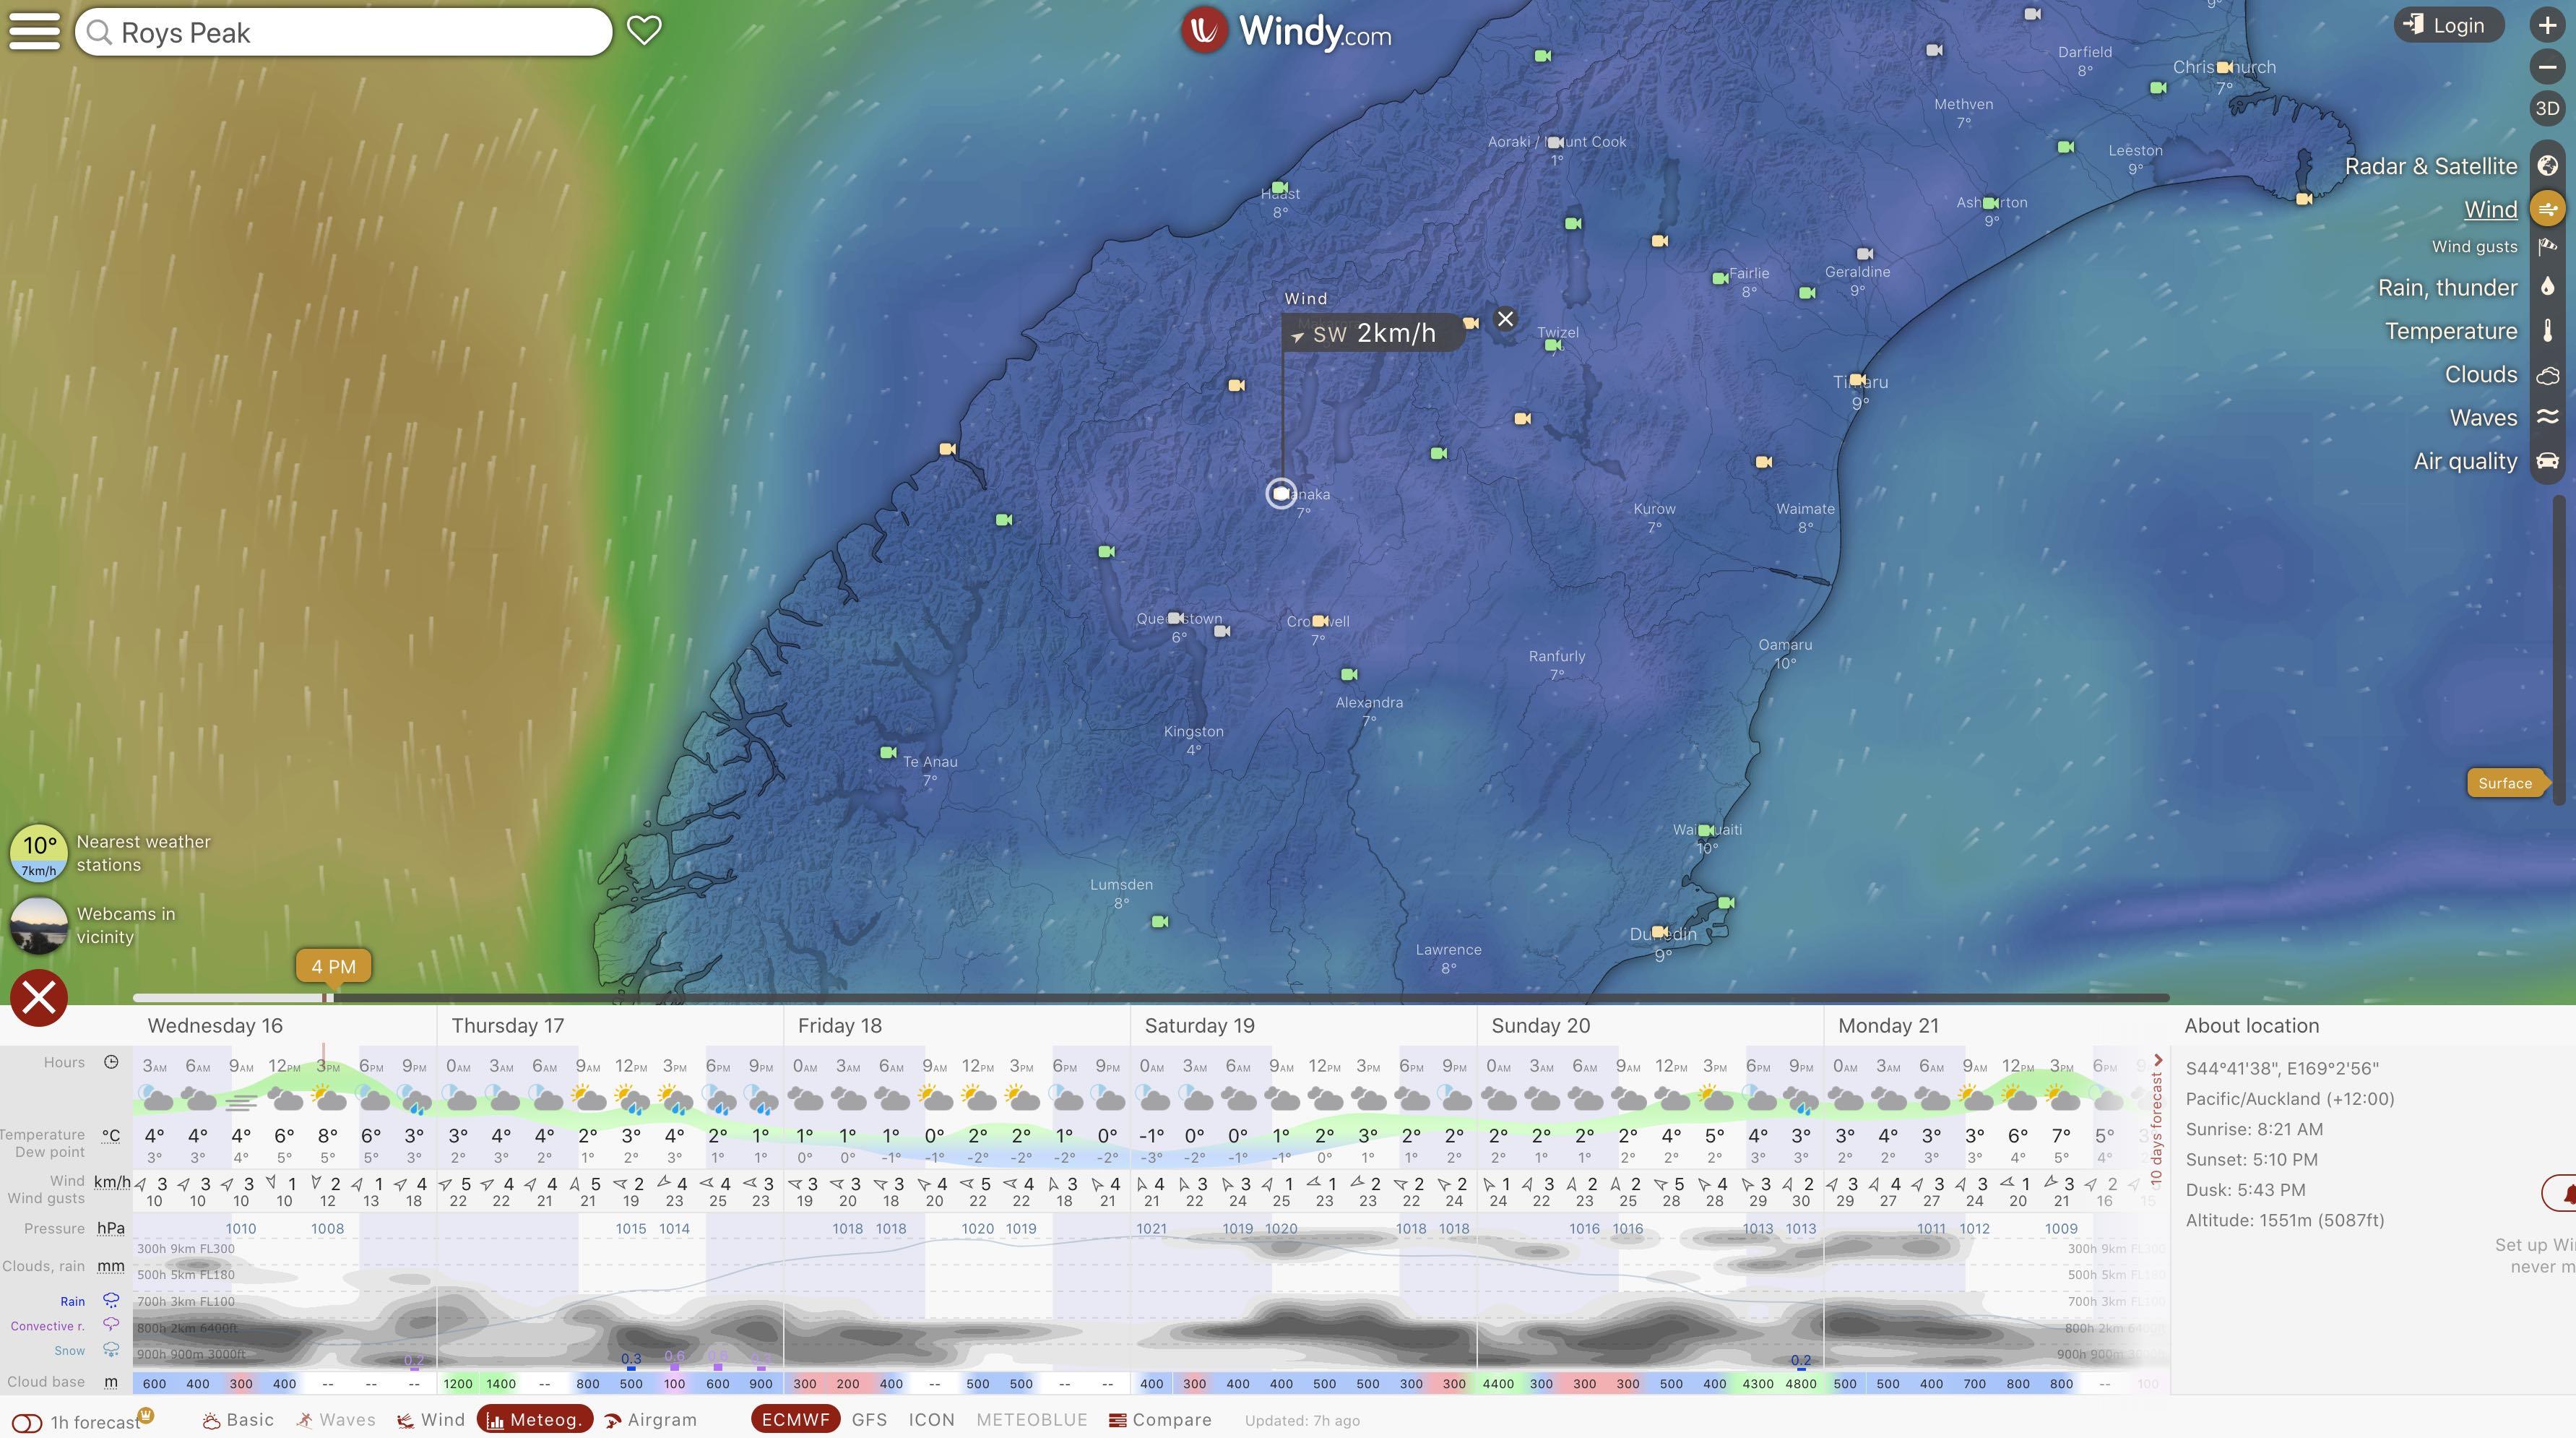 Roys Peak Forecast Windy